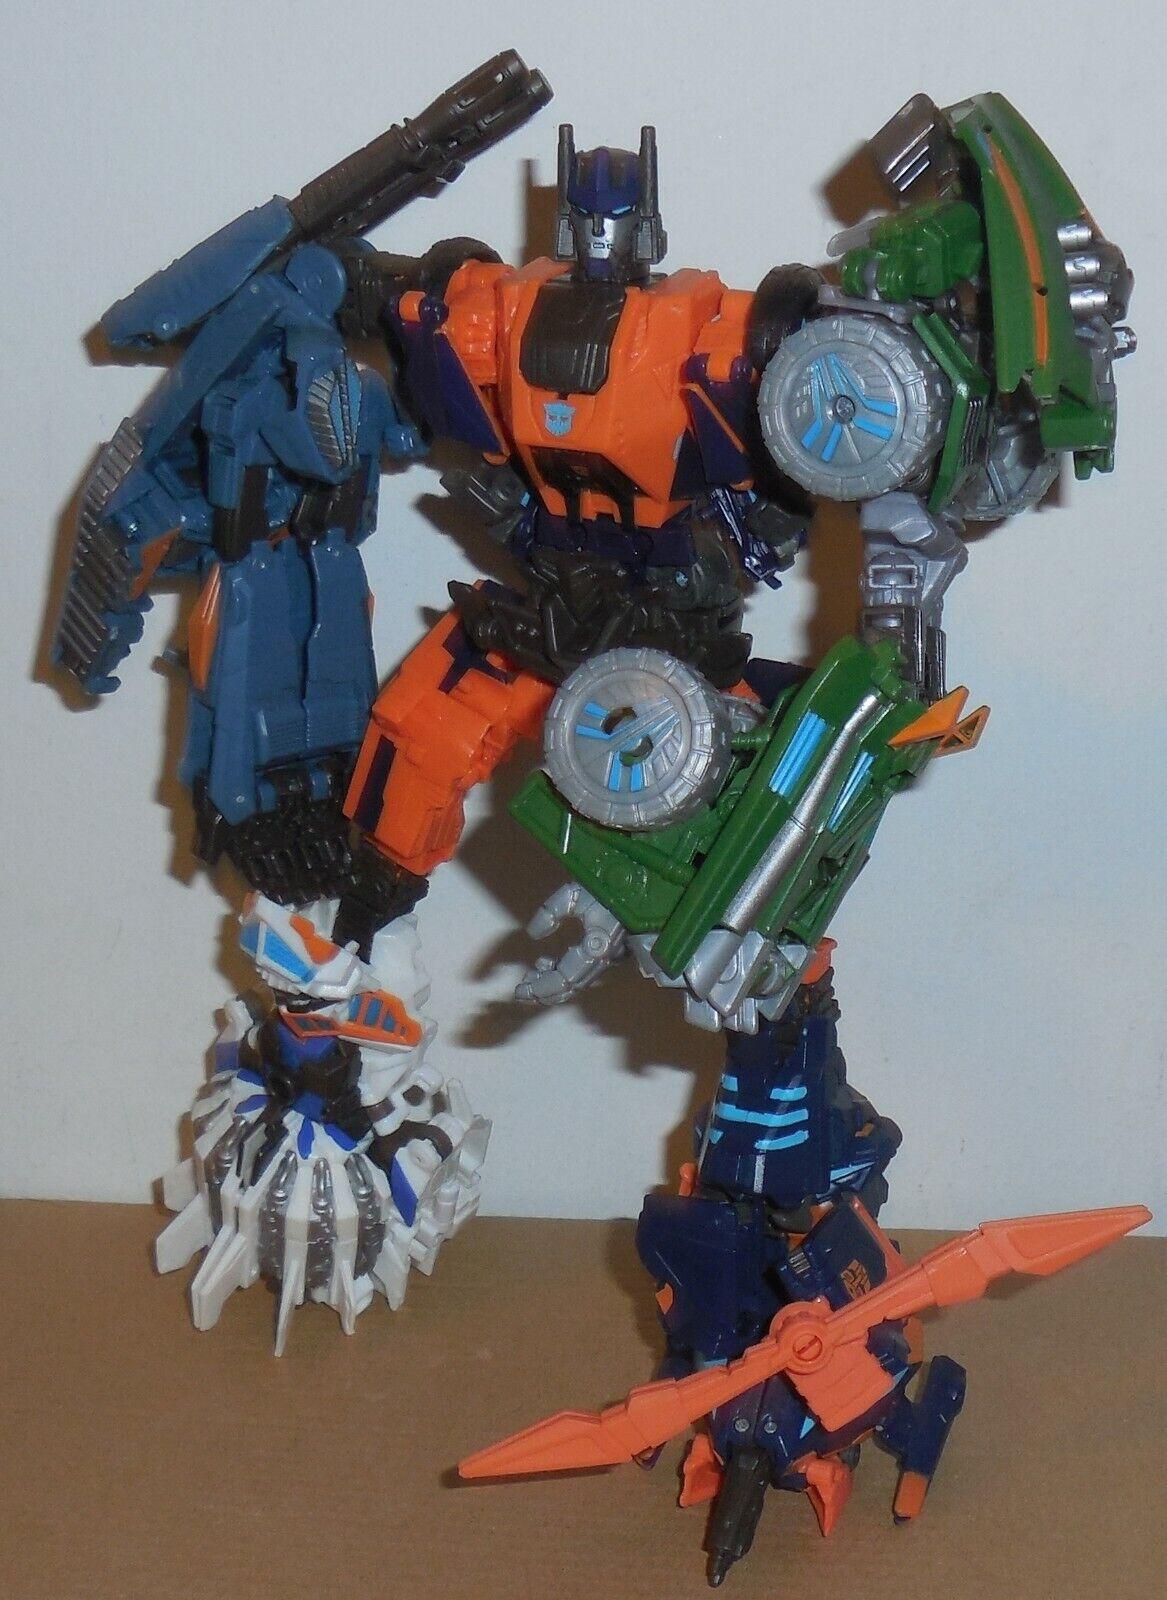 Transformers Generations Fall Of Cybertron Cybertron Cybertron RUINATION Combiner Foc 91c640